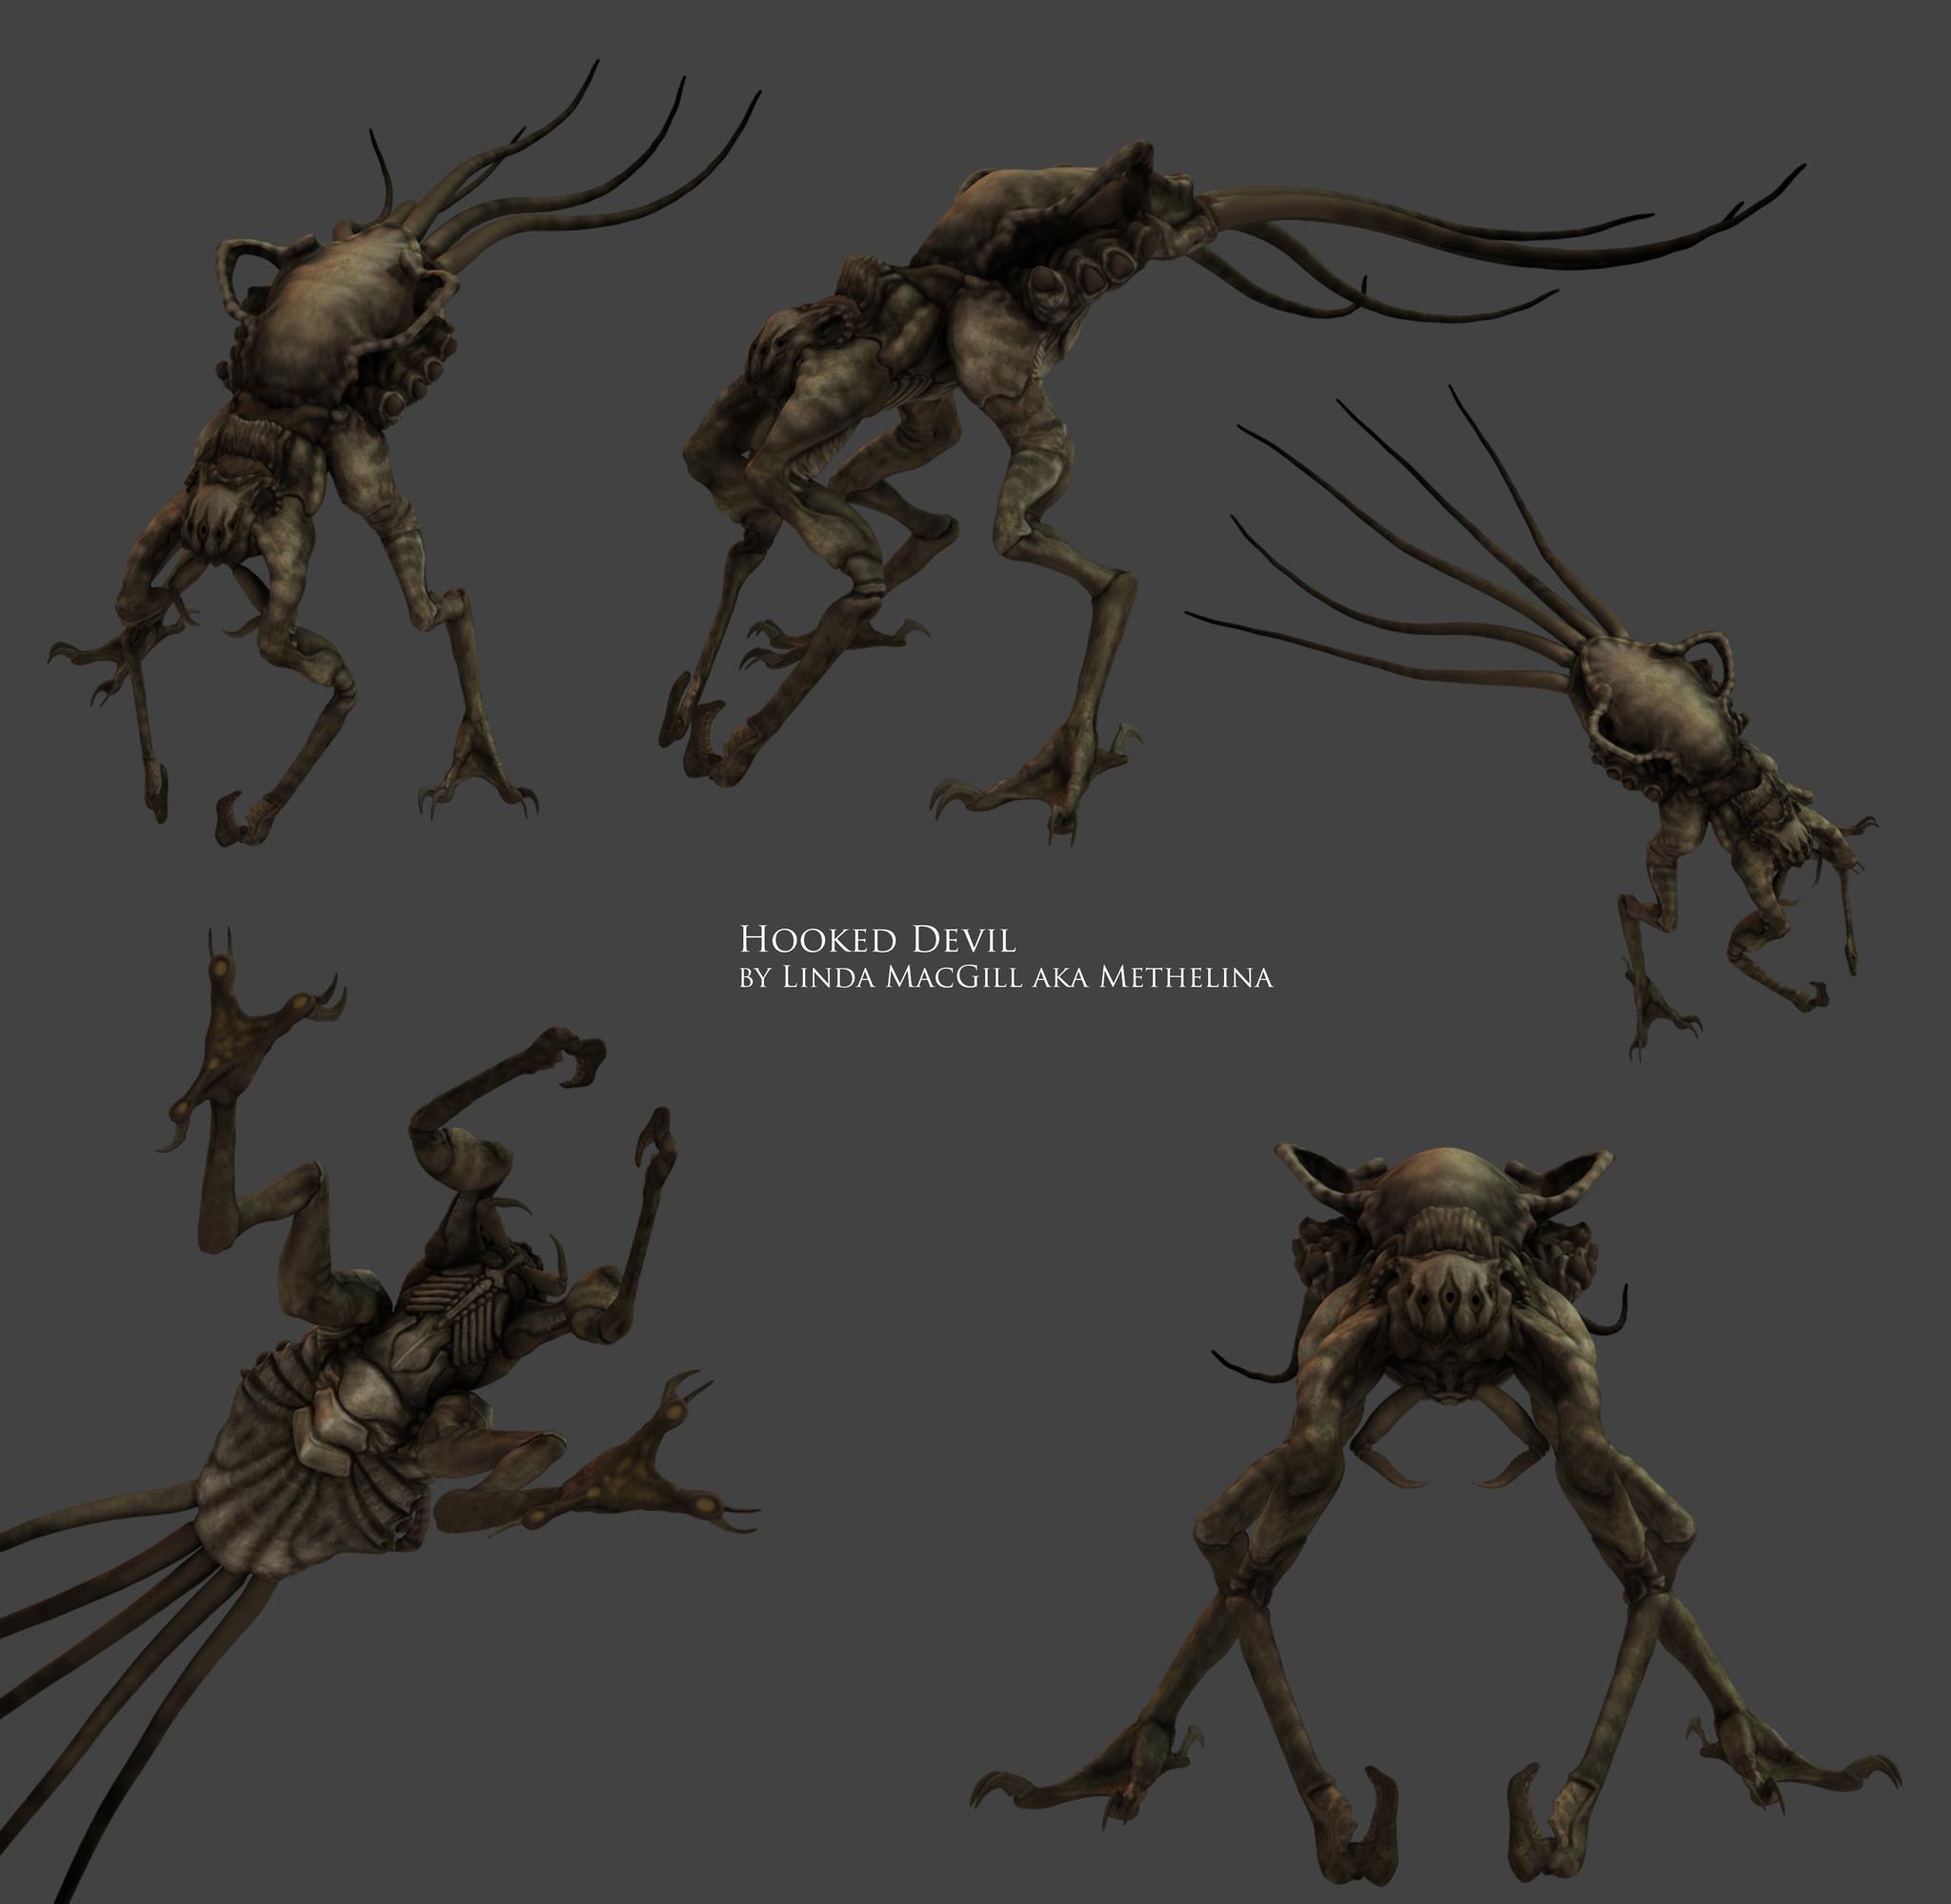 hooked_devil_by_methelina-d8apgen-1.png